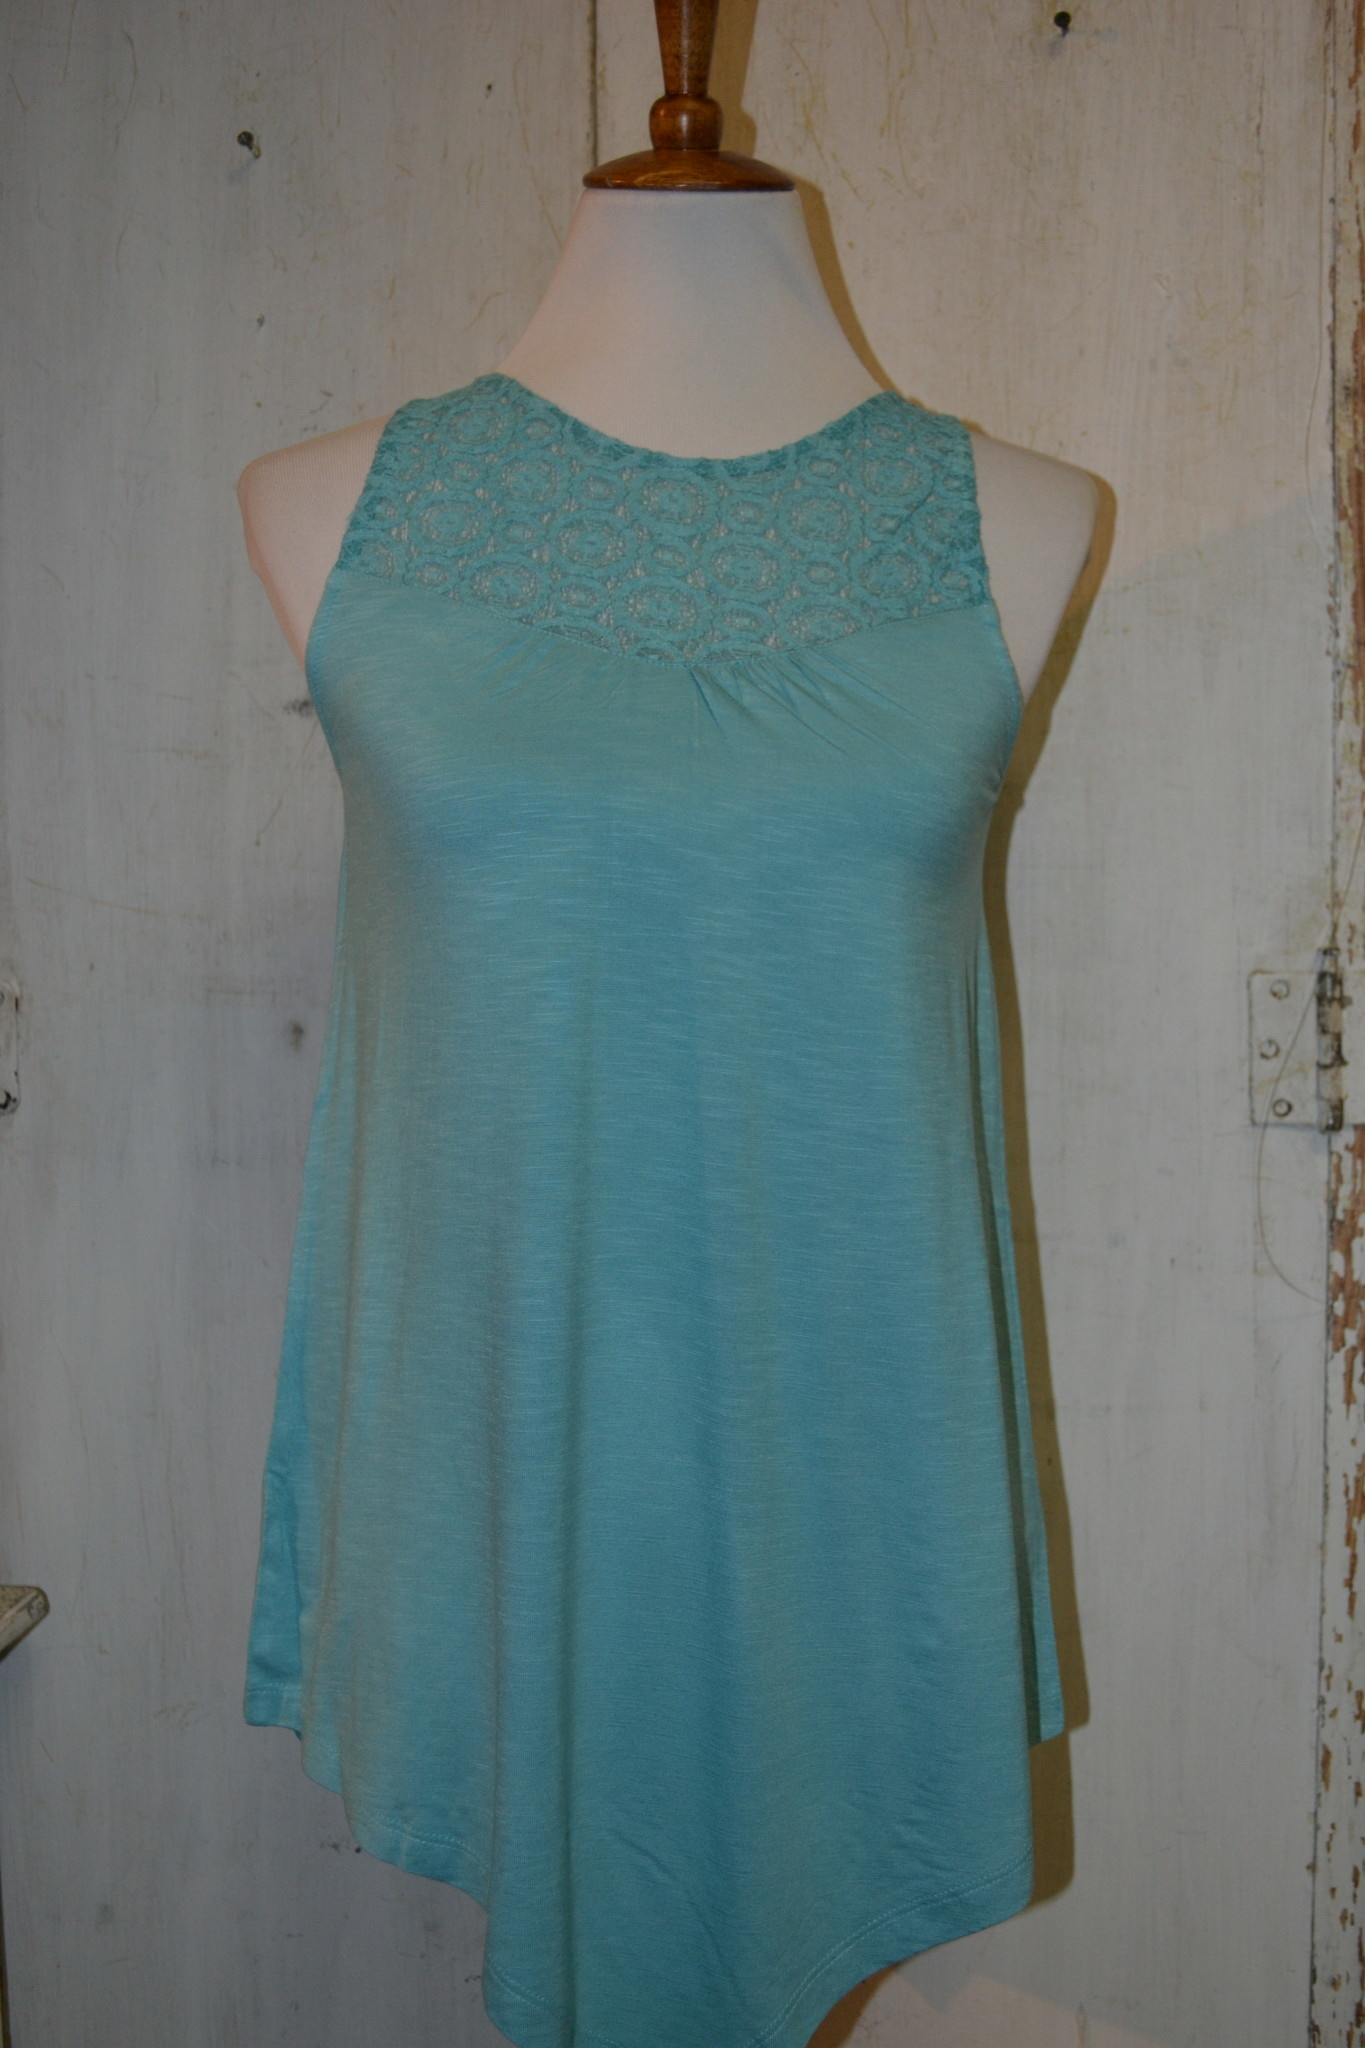 Knit Lace Tank Top (2-Colors/4-Sizes)